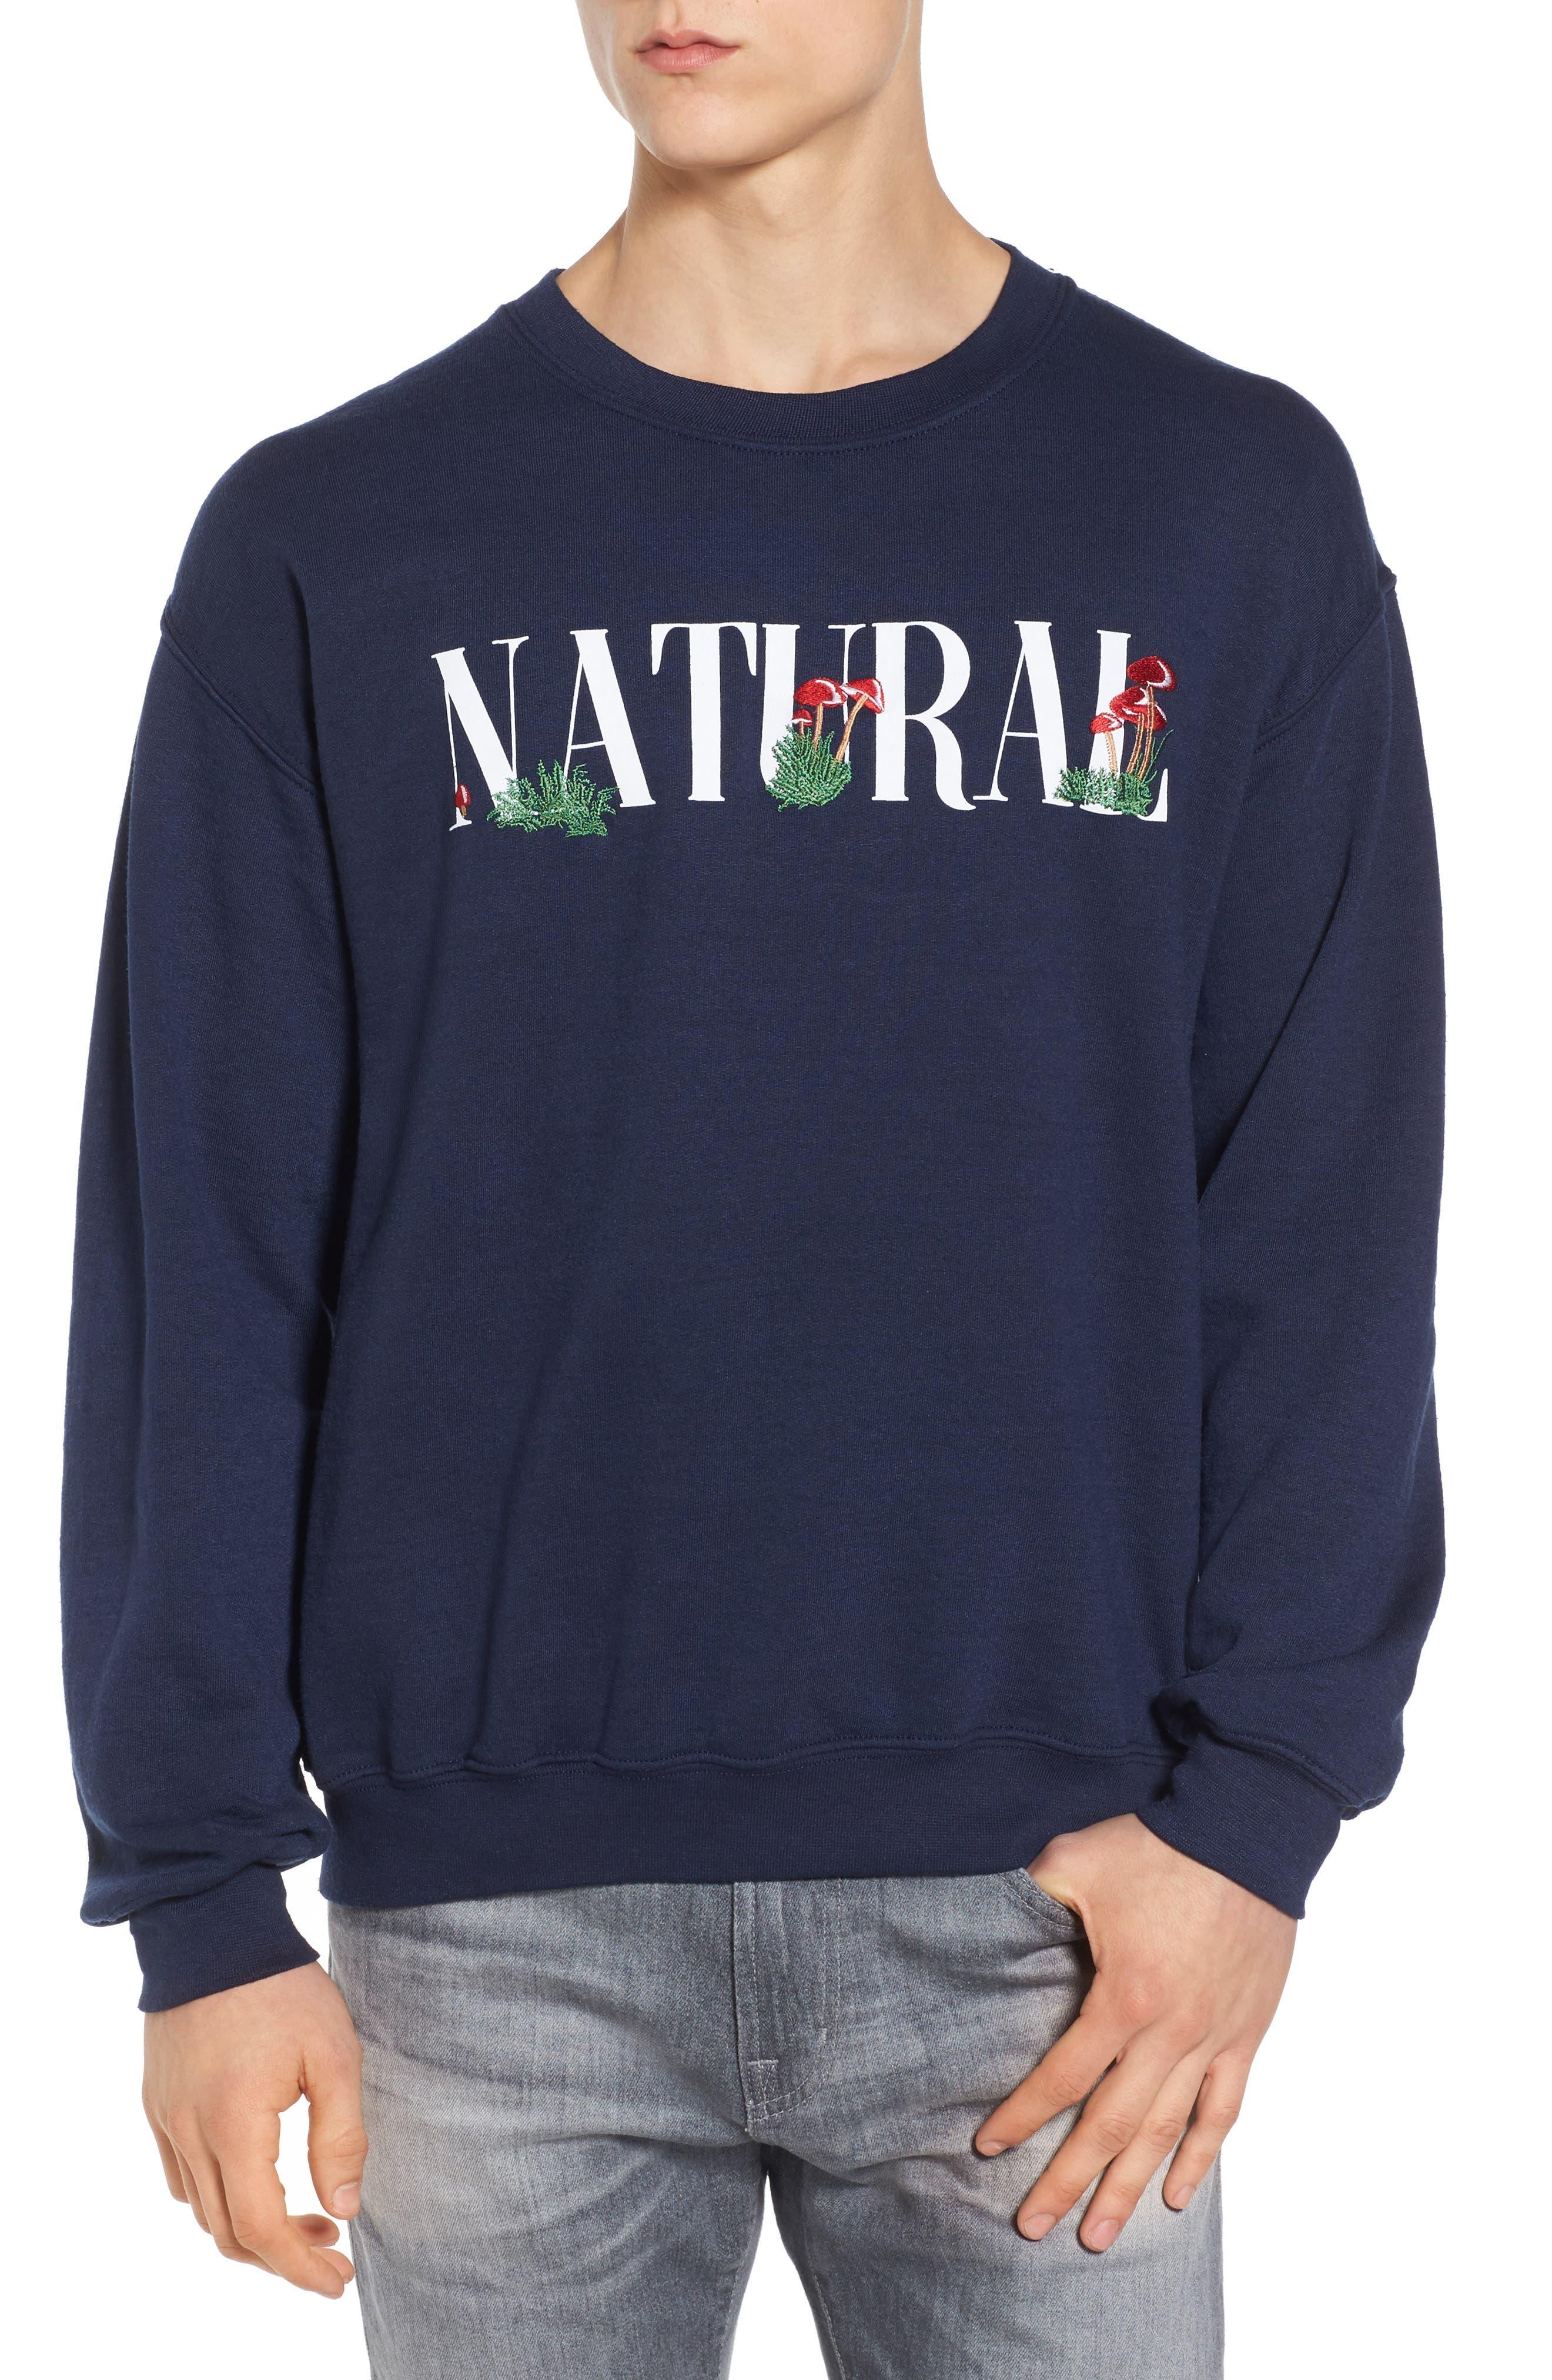 Natural Mushroom Sweatshirt,                             Main thumbnail 1, color,                             Blue